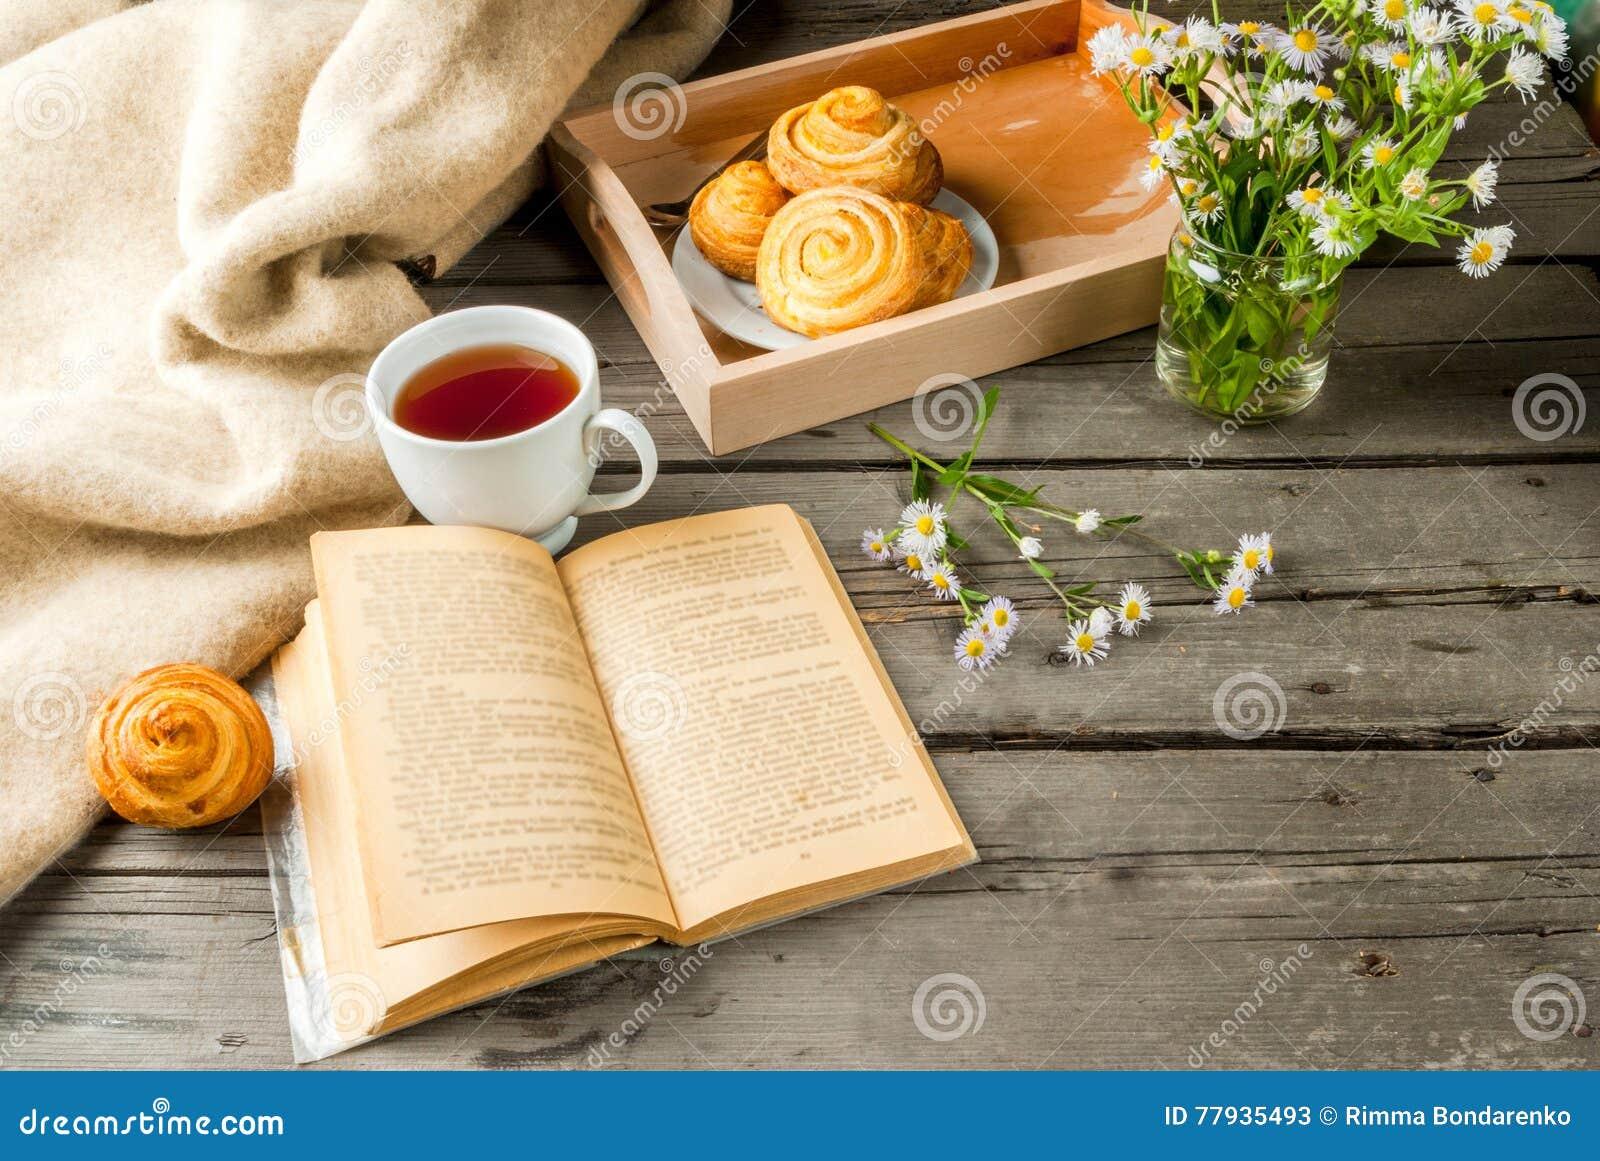 Cozy Breakfast With Freshly Baked Scones Stock Image